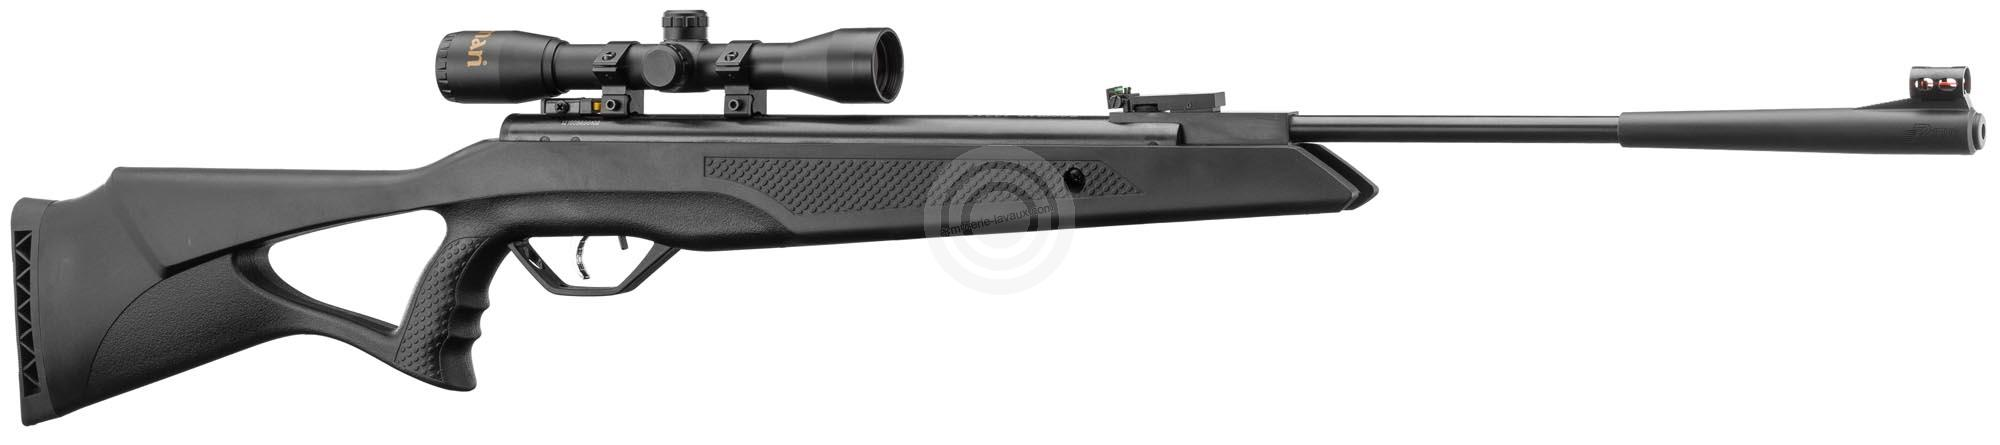 Carabine à plombs BEEMAN Longhorn cal.4,5mm